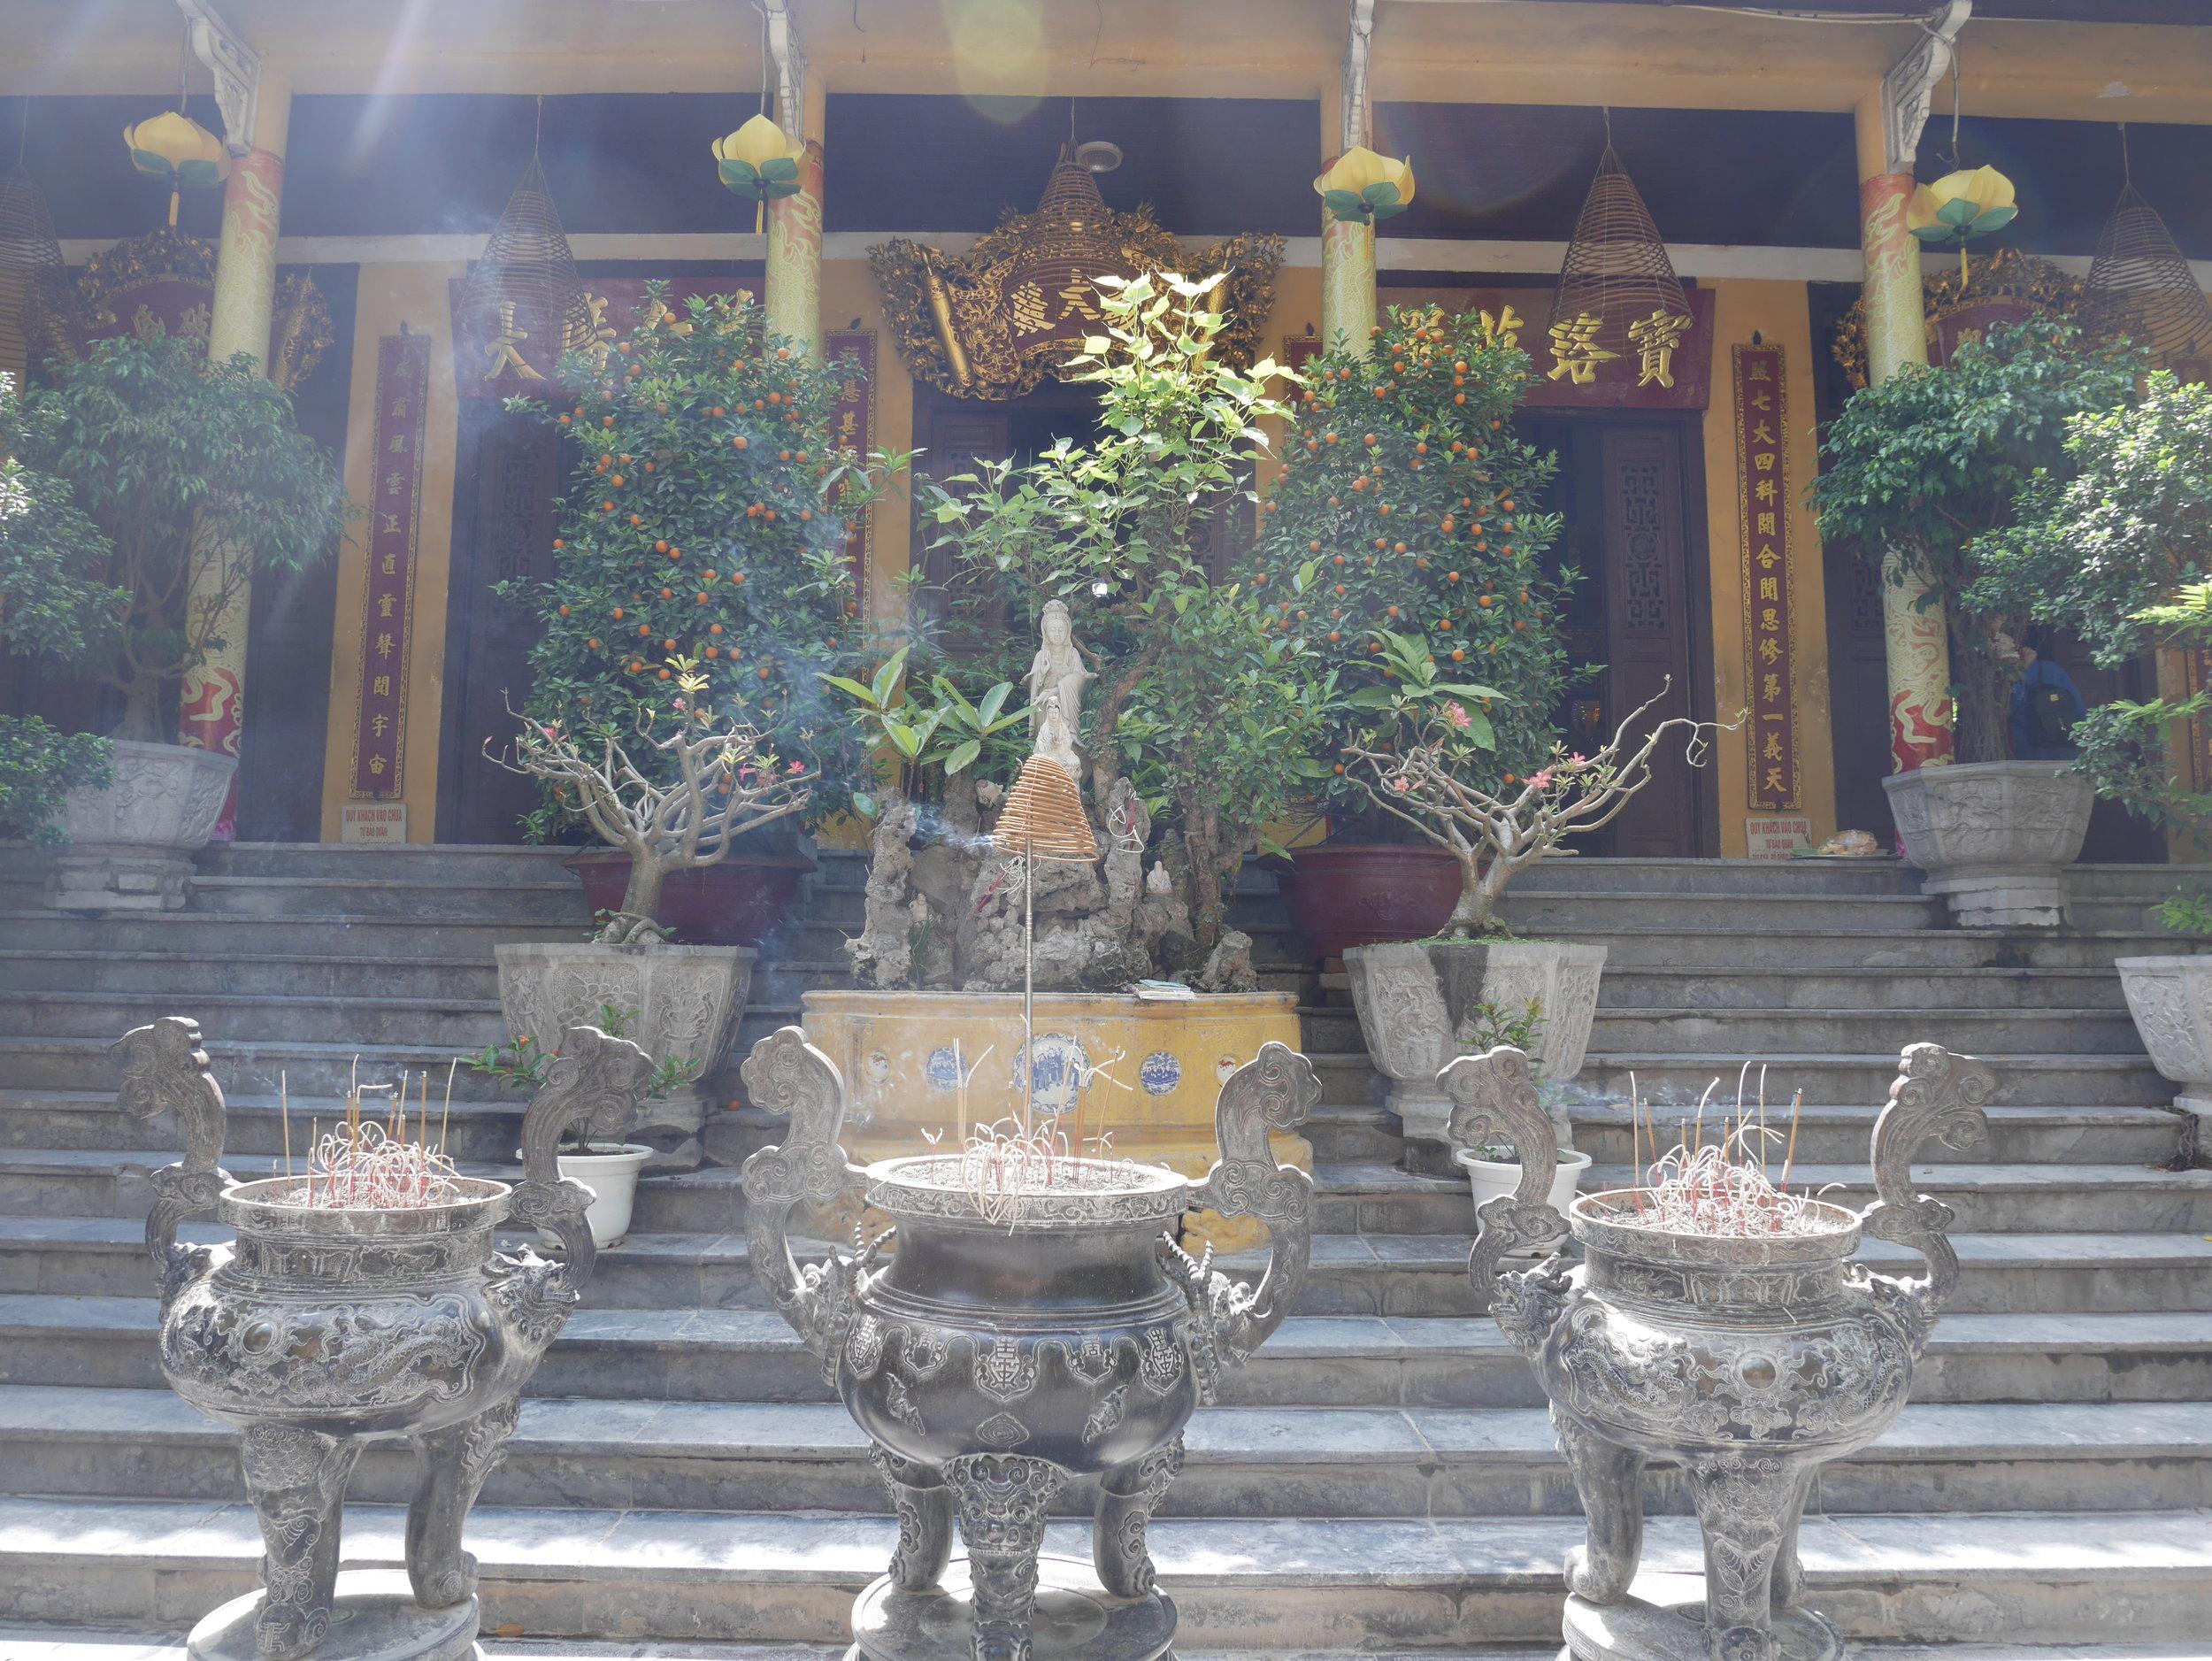 incense burners at Quan Su Temple